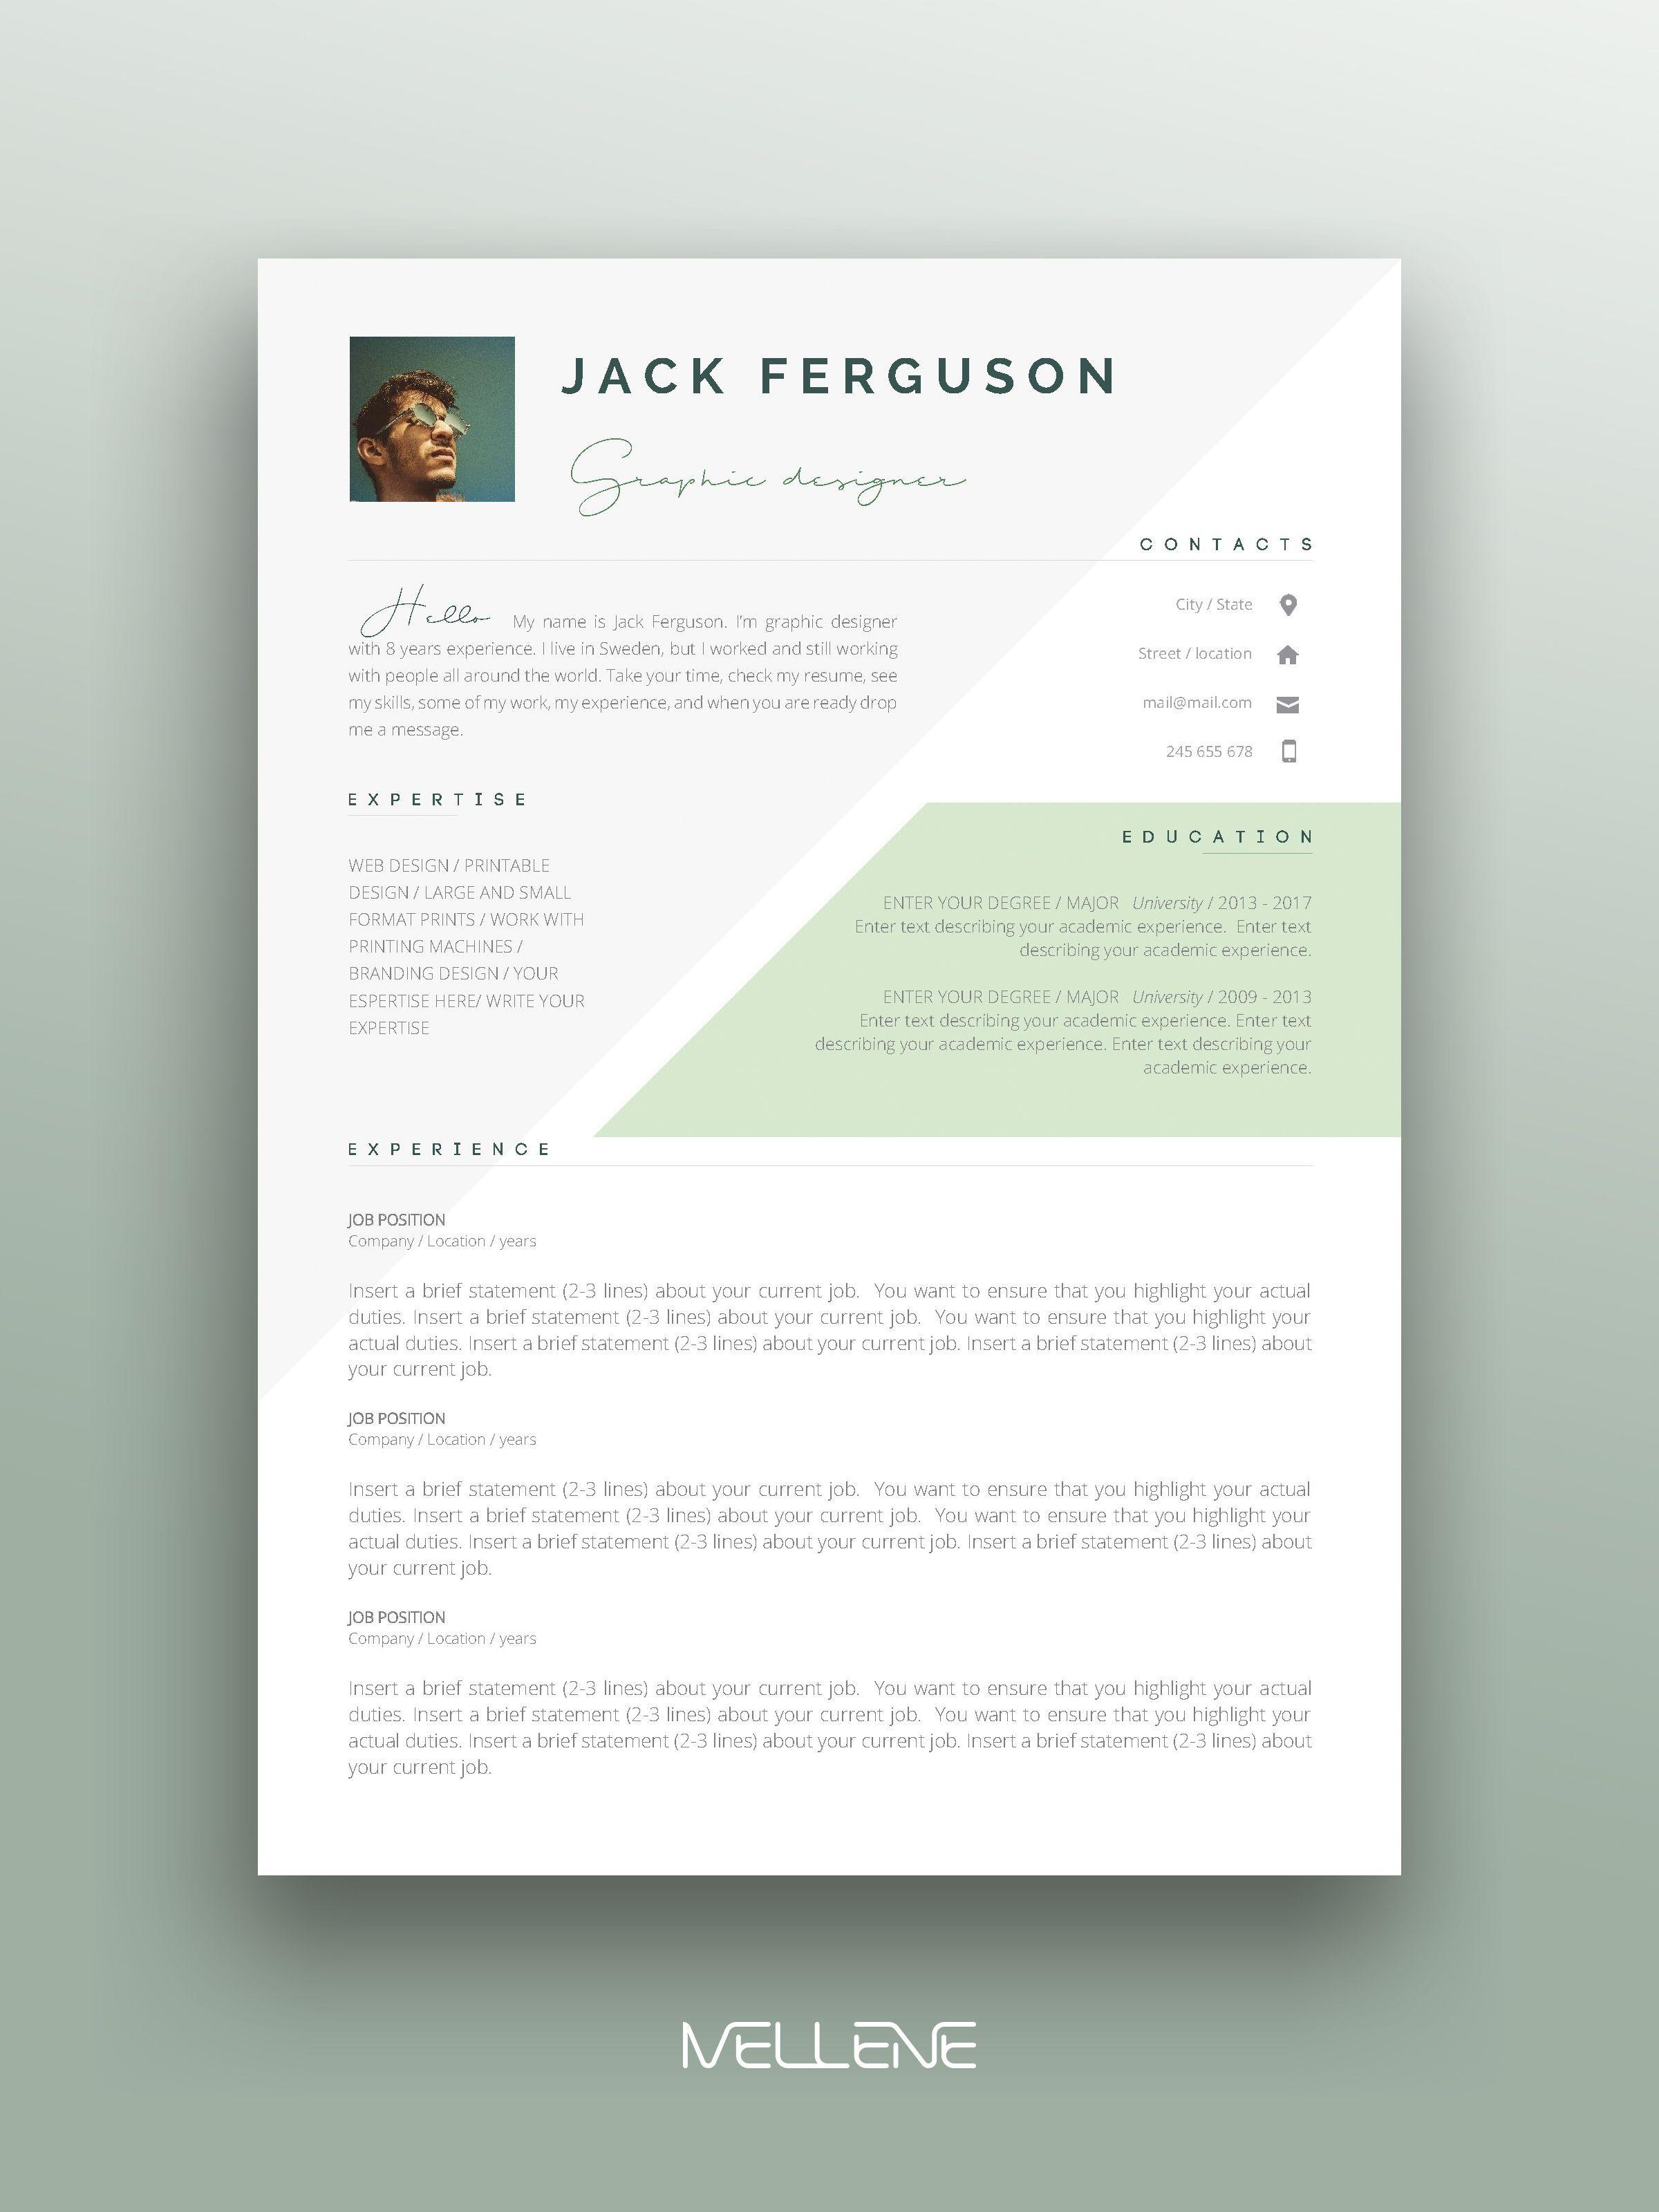 Resume CV template for MS Word Professional application cover letter Self presentation branding